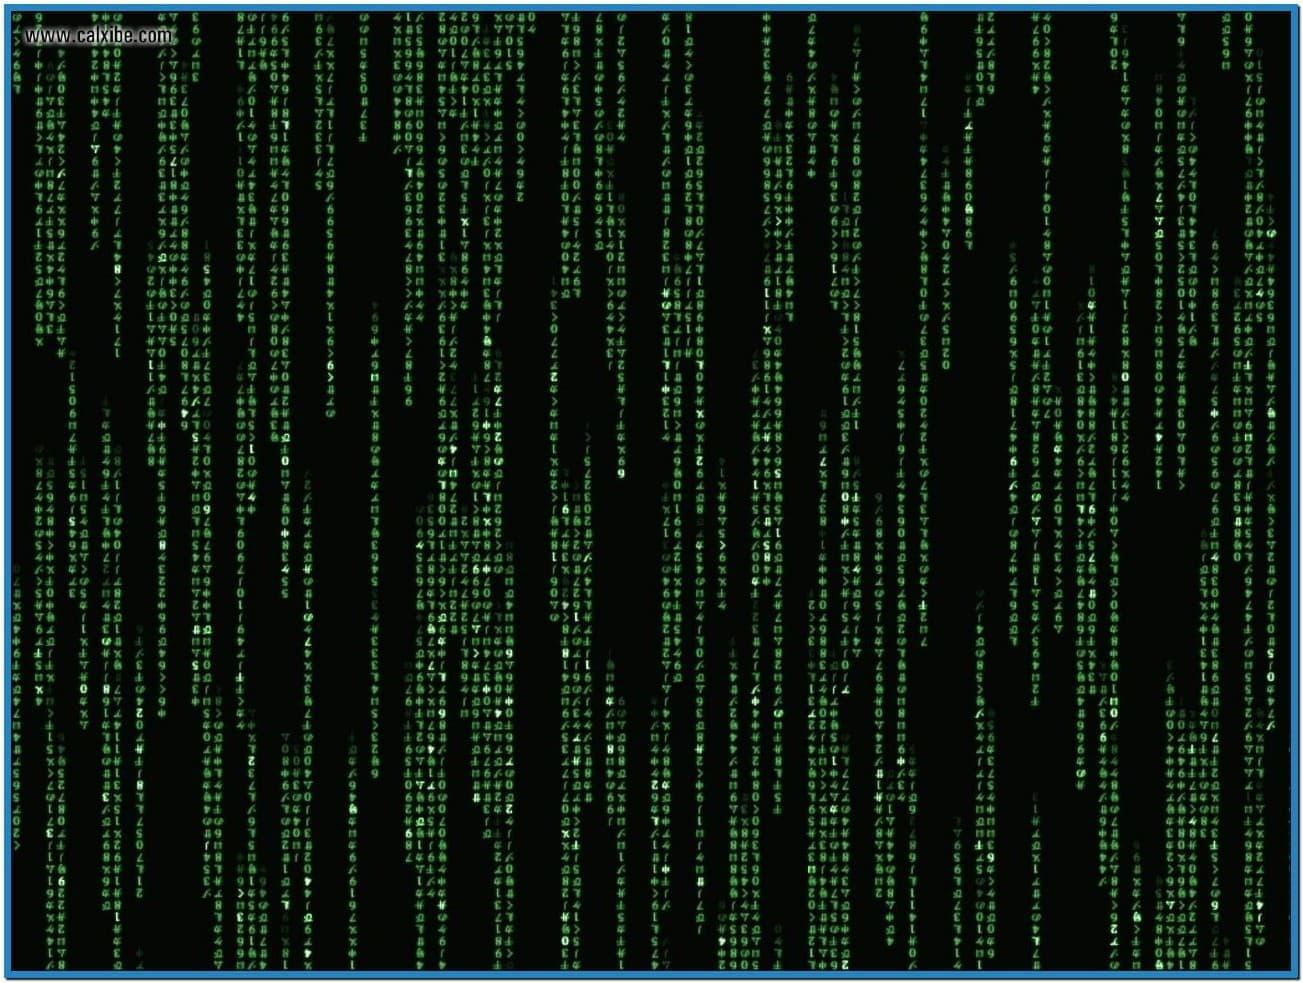 50+] The Matrix Wallpaper and Screensaver on WallpaperSafari